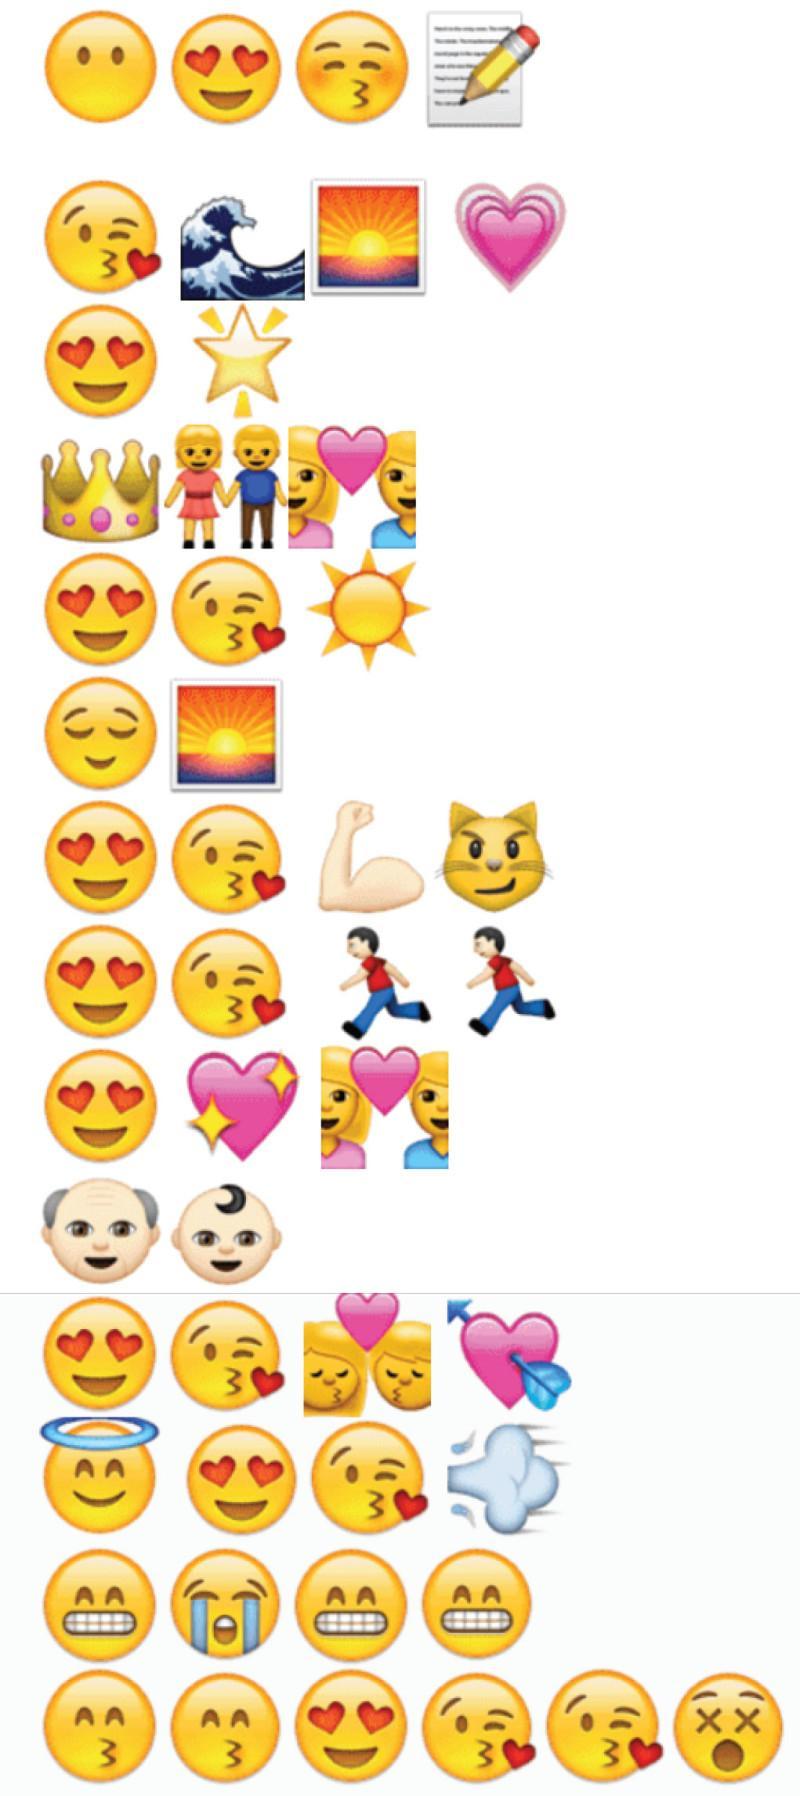 Modern love: Emoji versions of the greatest love poems - The DePaulia